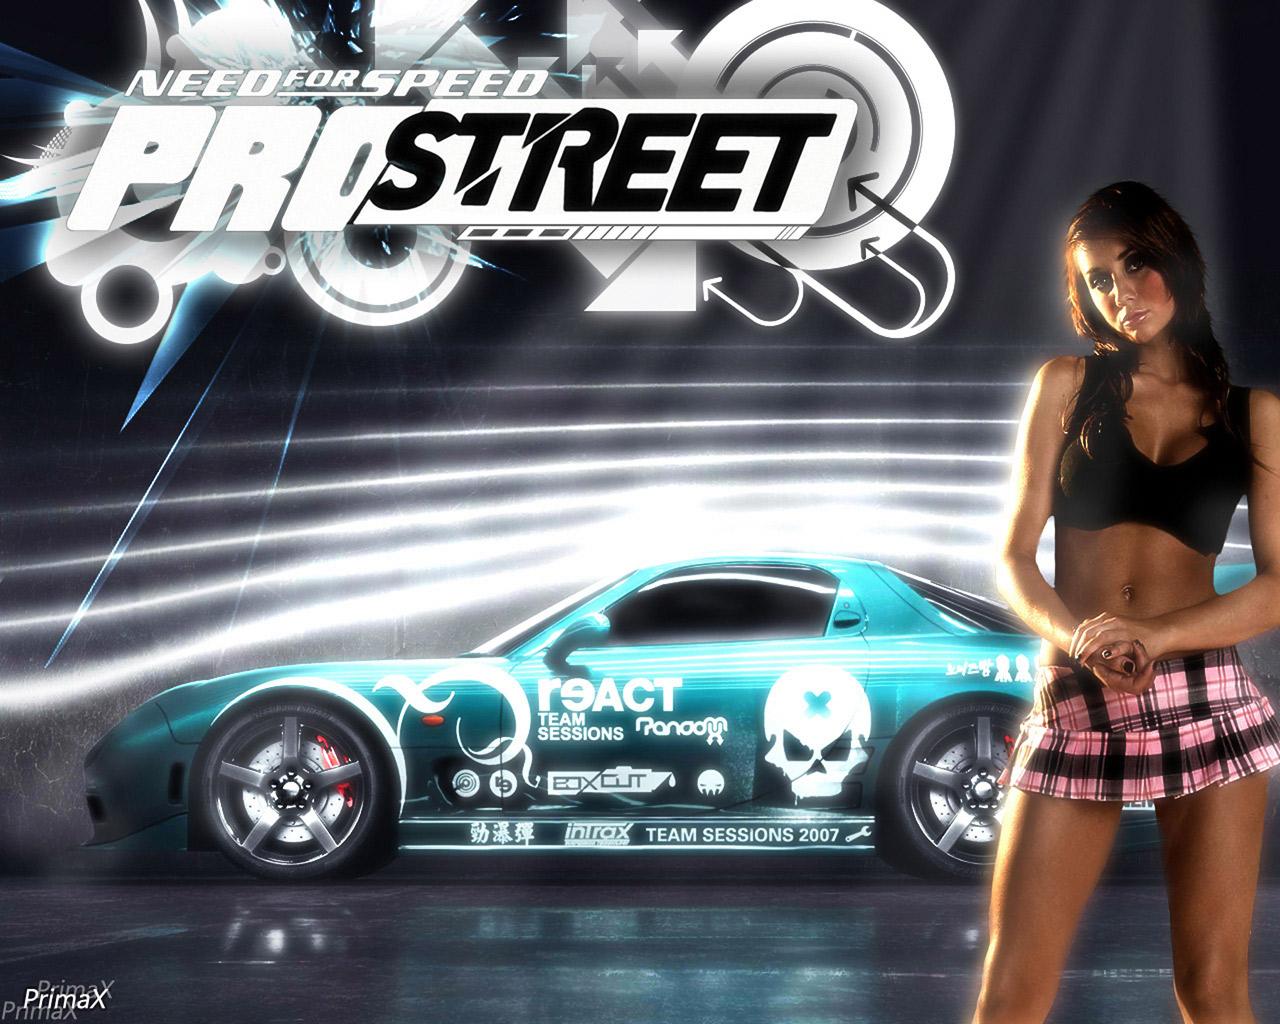 baixar games gratuitos download need for speed pro street. Black Bedroom Furniture Sets. Home Design Ideas